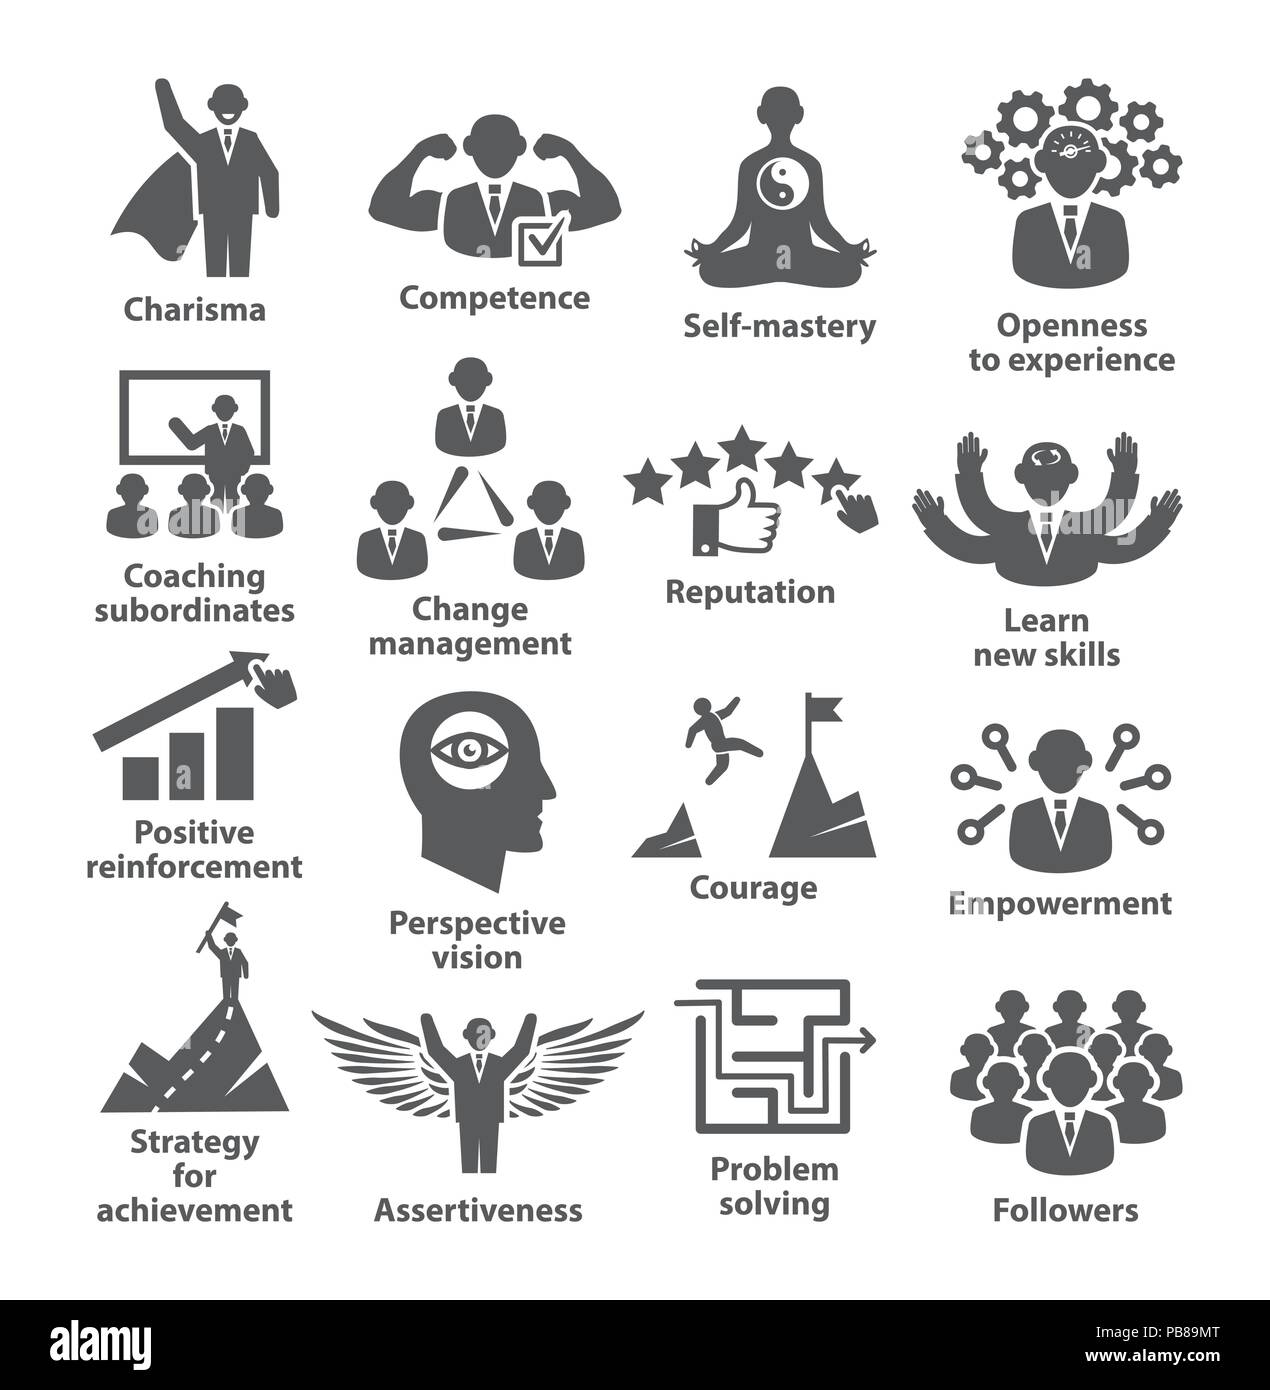 Business Management Pack di icone 45 icone per la leadership, Carriera Immagini Stock